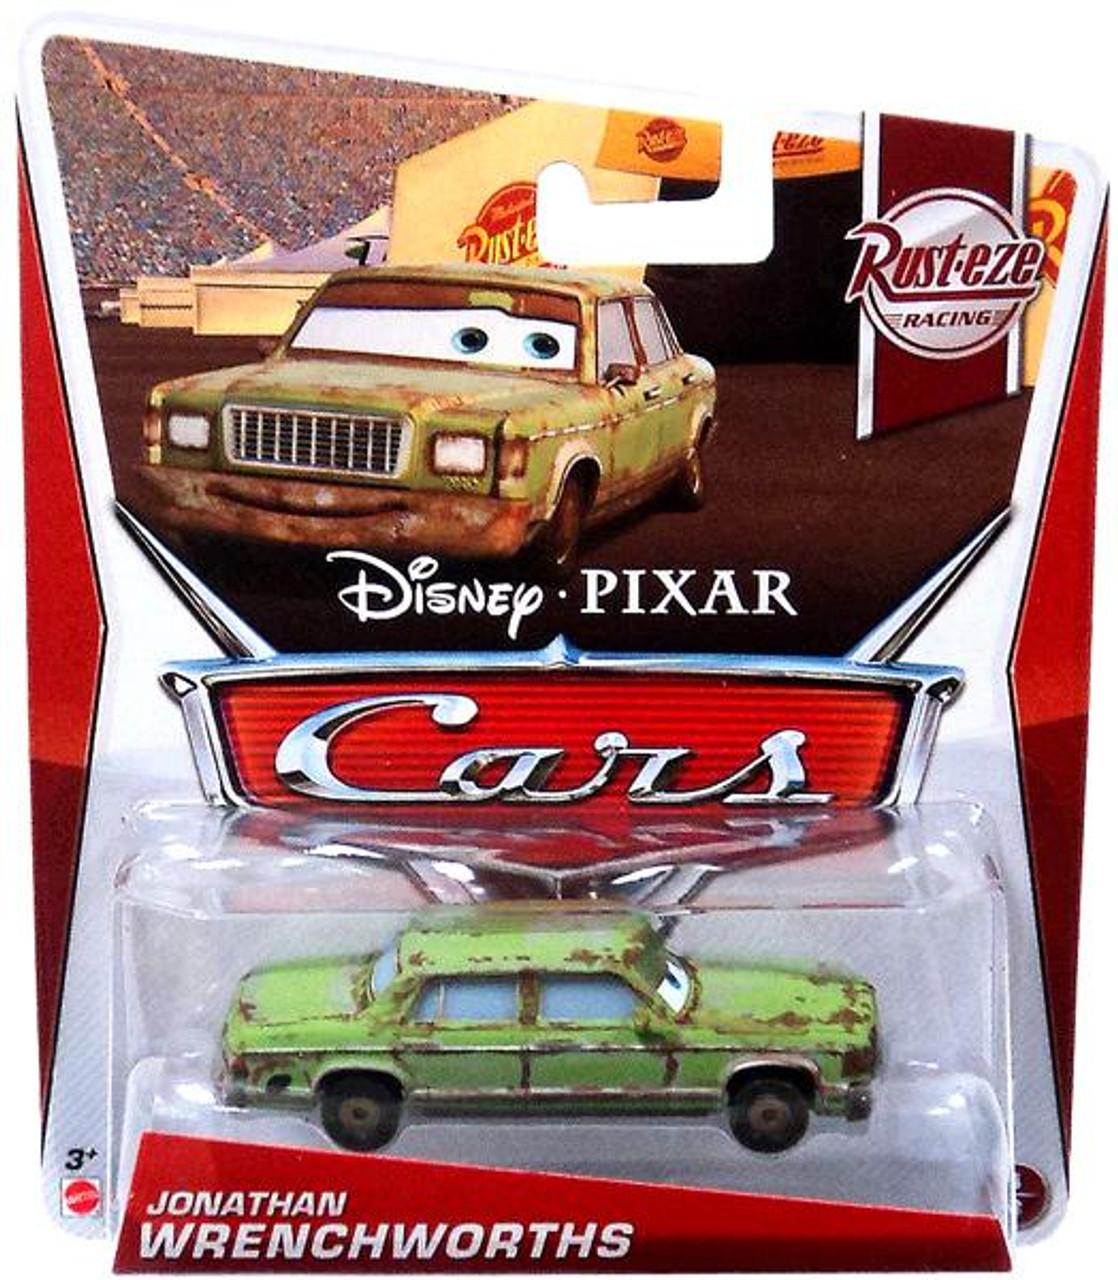 Disney Cars Series 3 Jonathan Wrenchworths Diecast Car